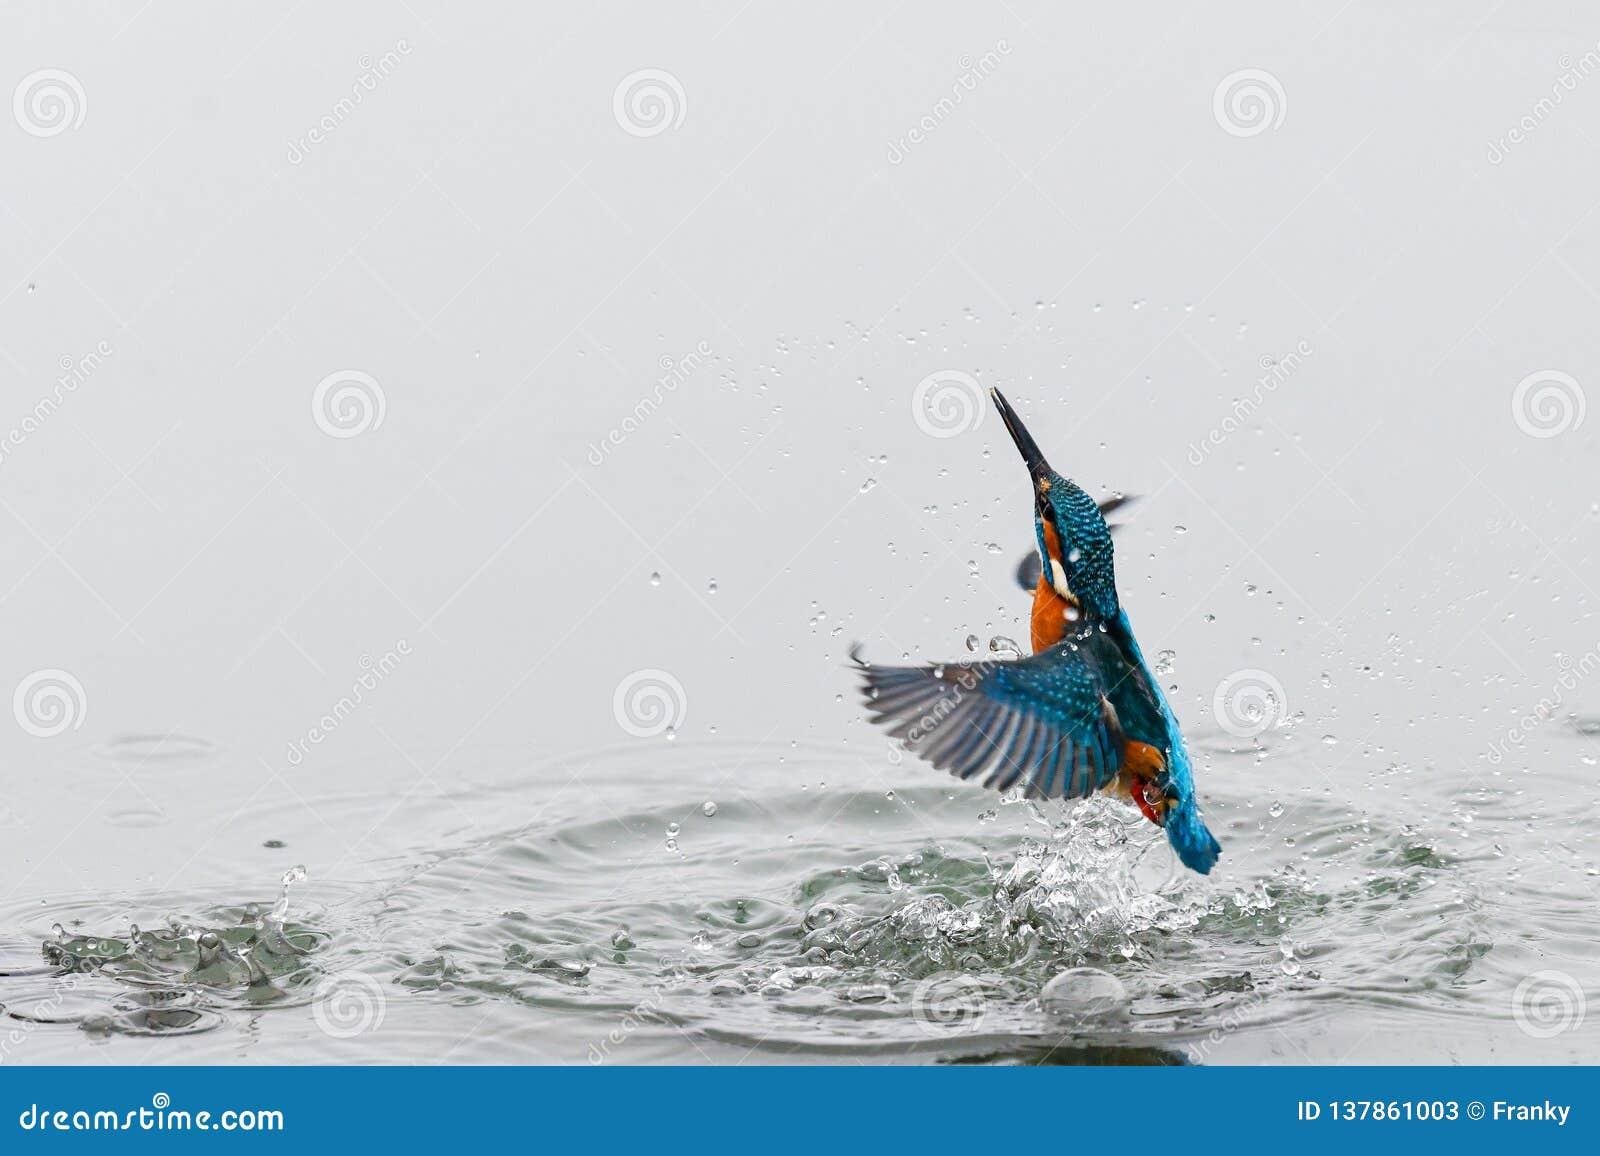 Фото действия kingfisher приходя вне от воды